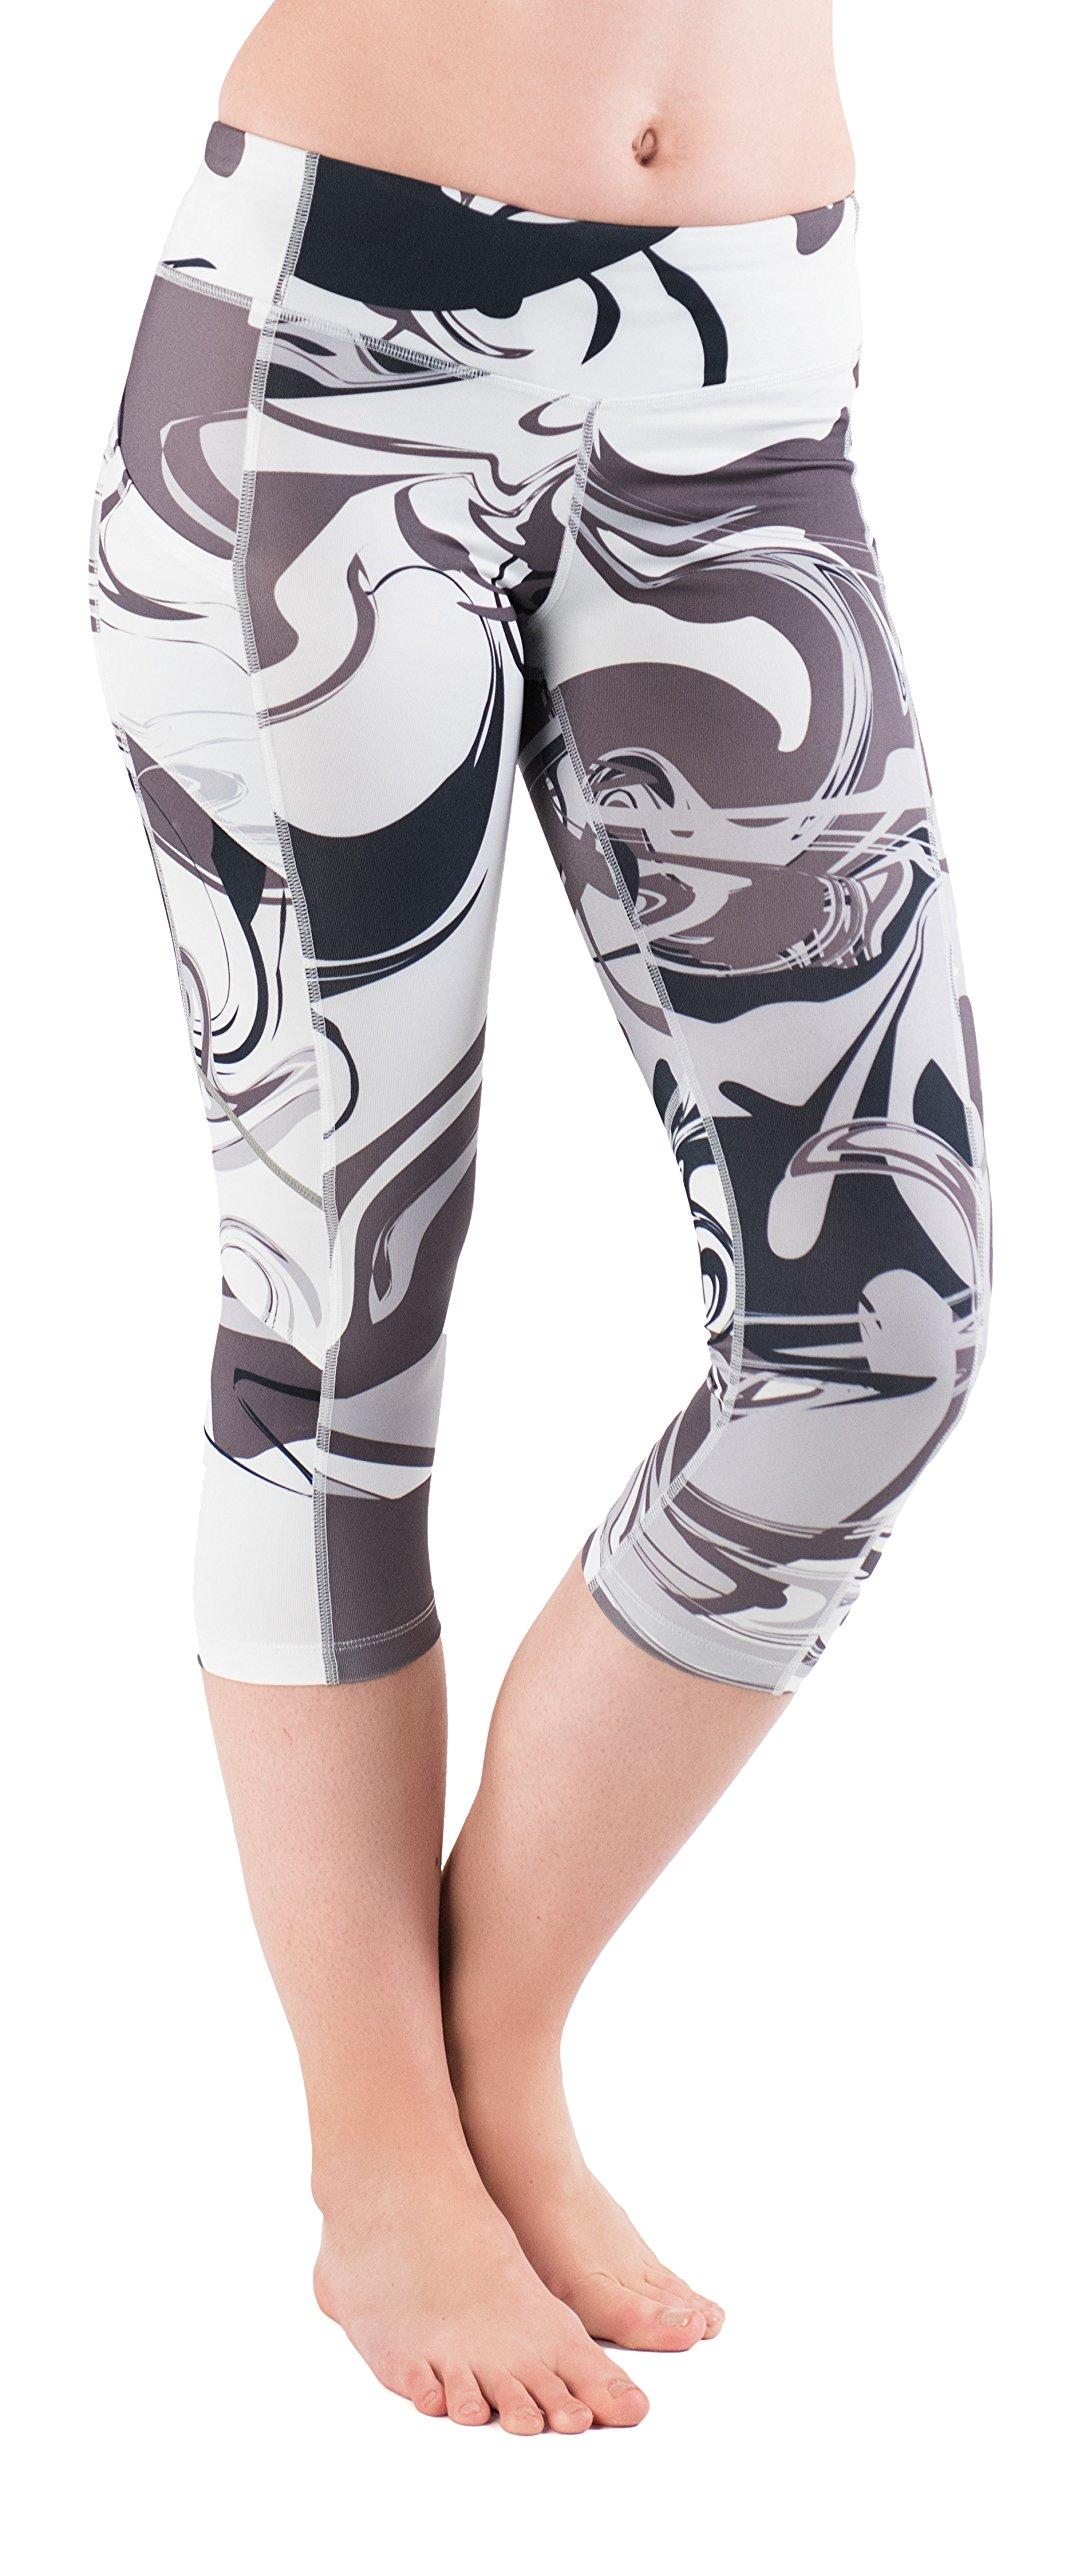 Skirt Sports Women's Pocketopia Capri, Persevere Print, X-Small by Skirt Sports